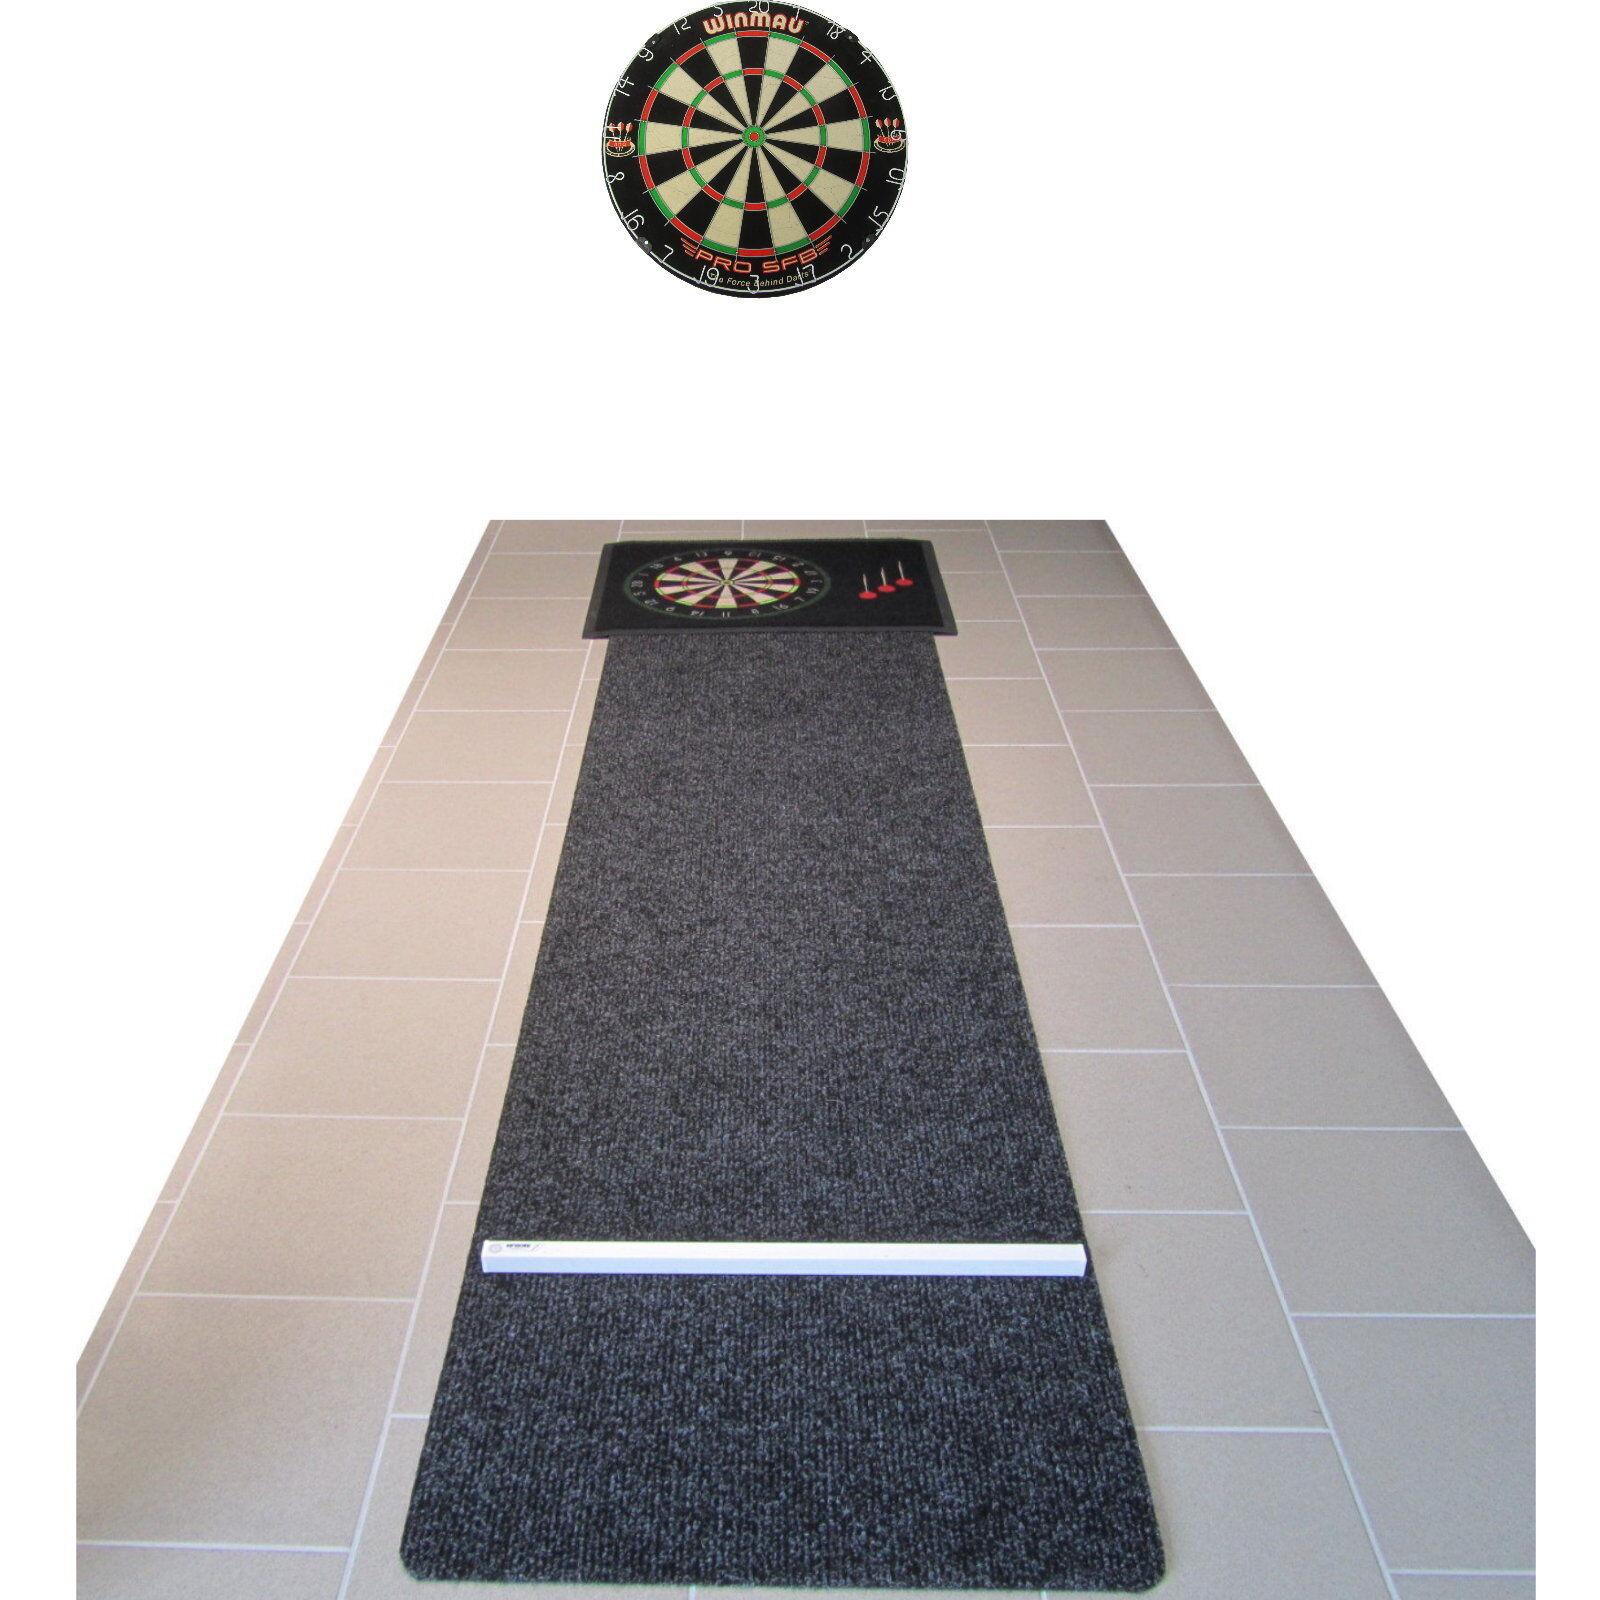 Winmau Professional Darts Set Disc + Carpet + Bouncer Protection Steeldart + 6 Arrows